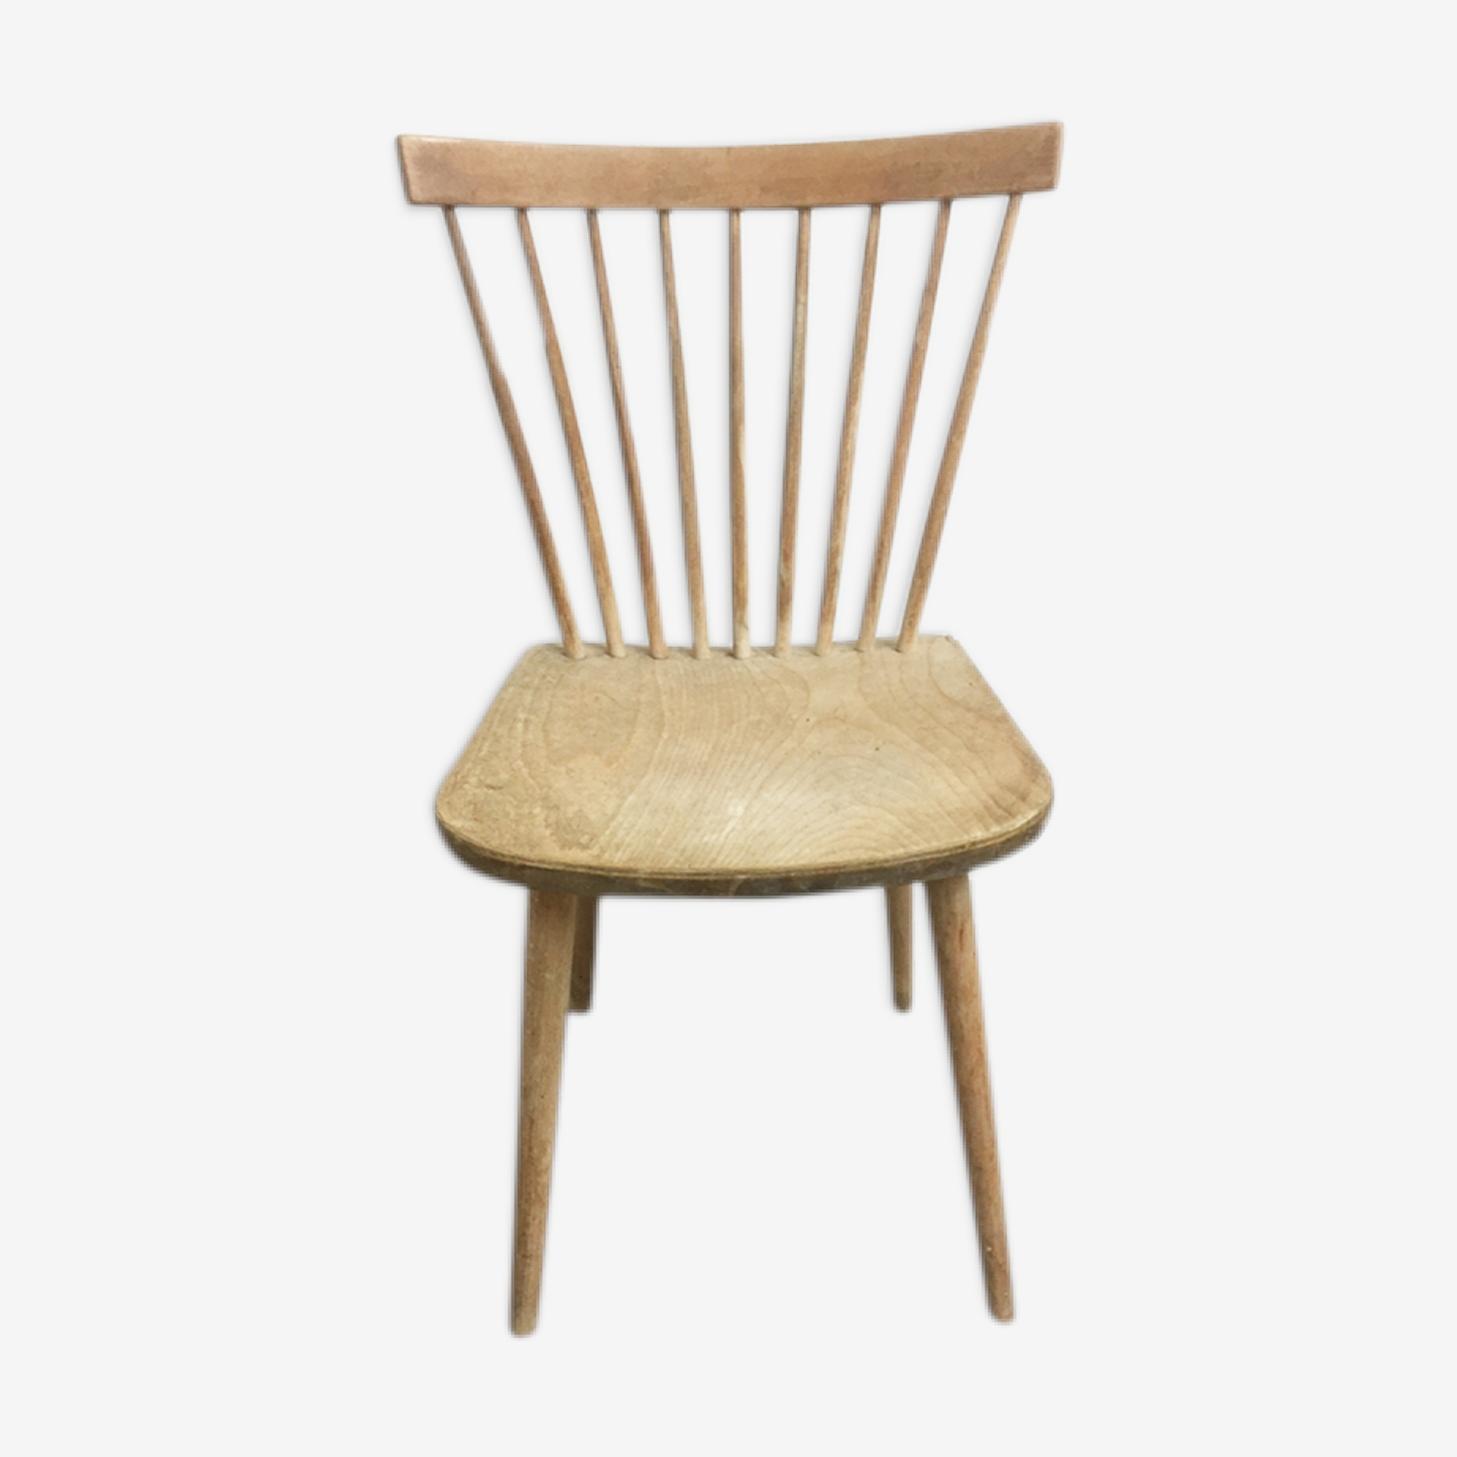 Scandinavian chair to bars, 1960